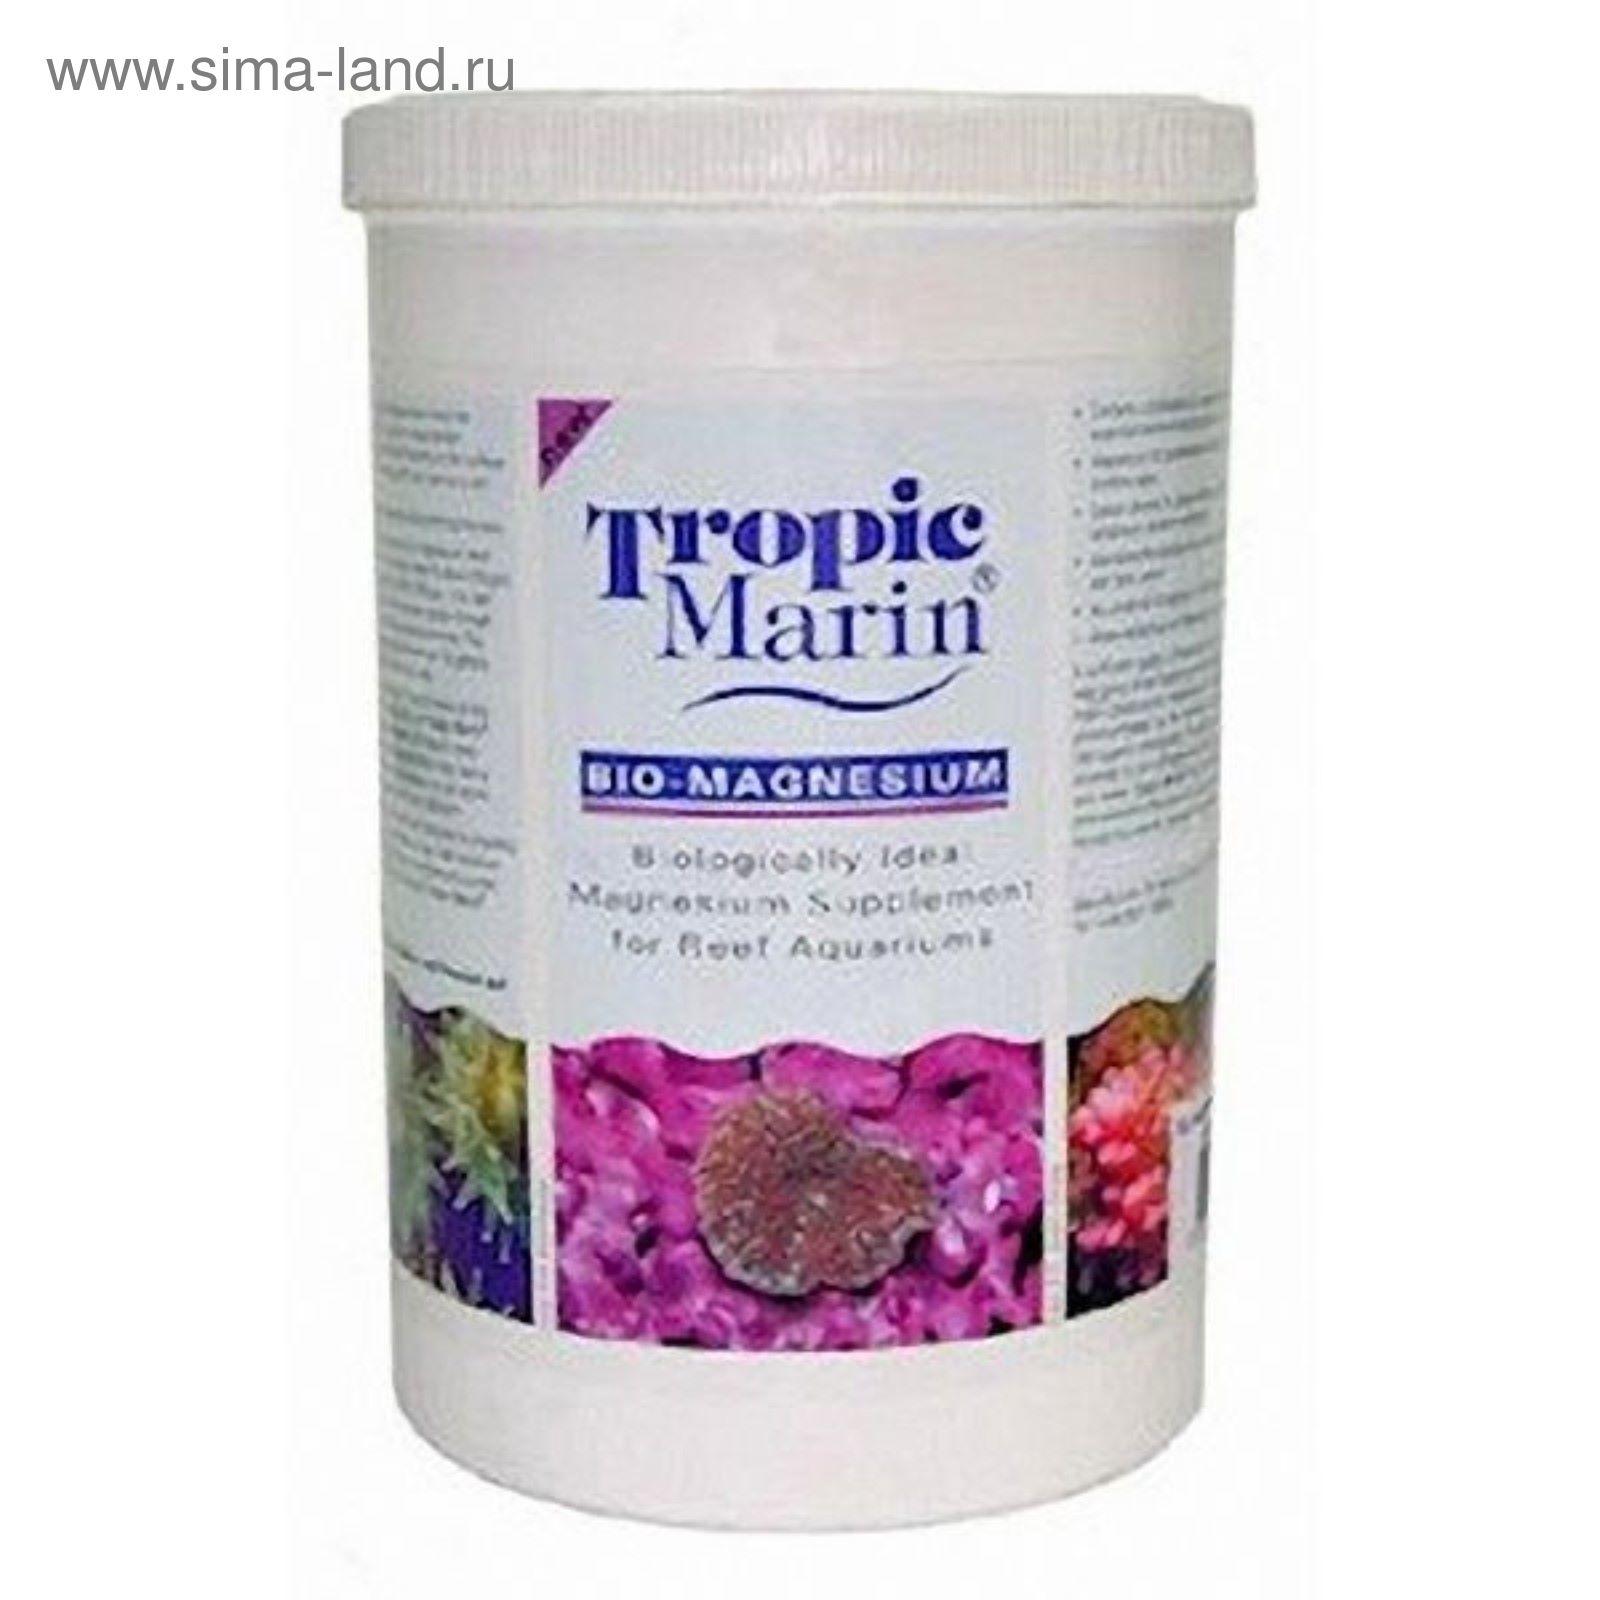 Добавка Bio-Magnesium 1,5кг